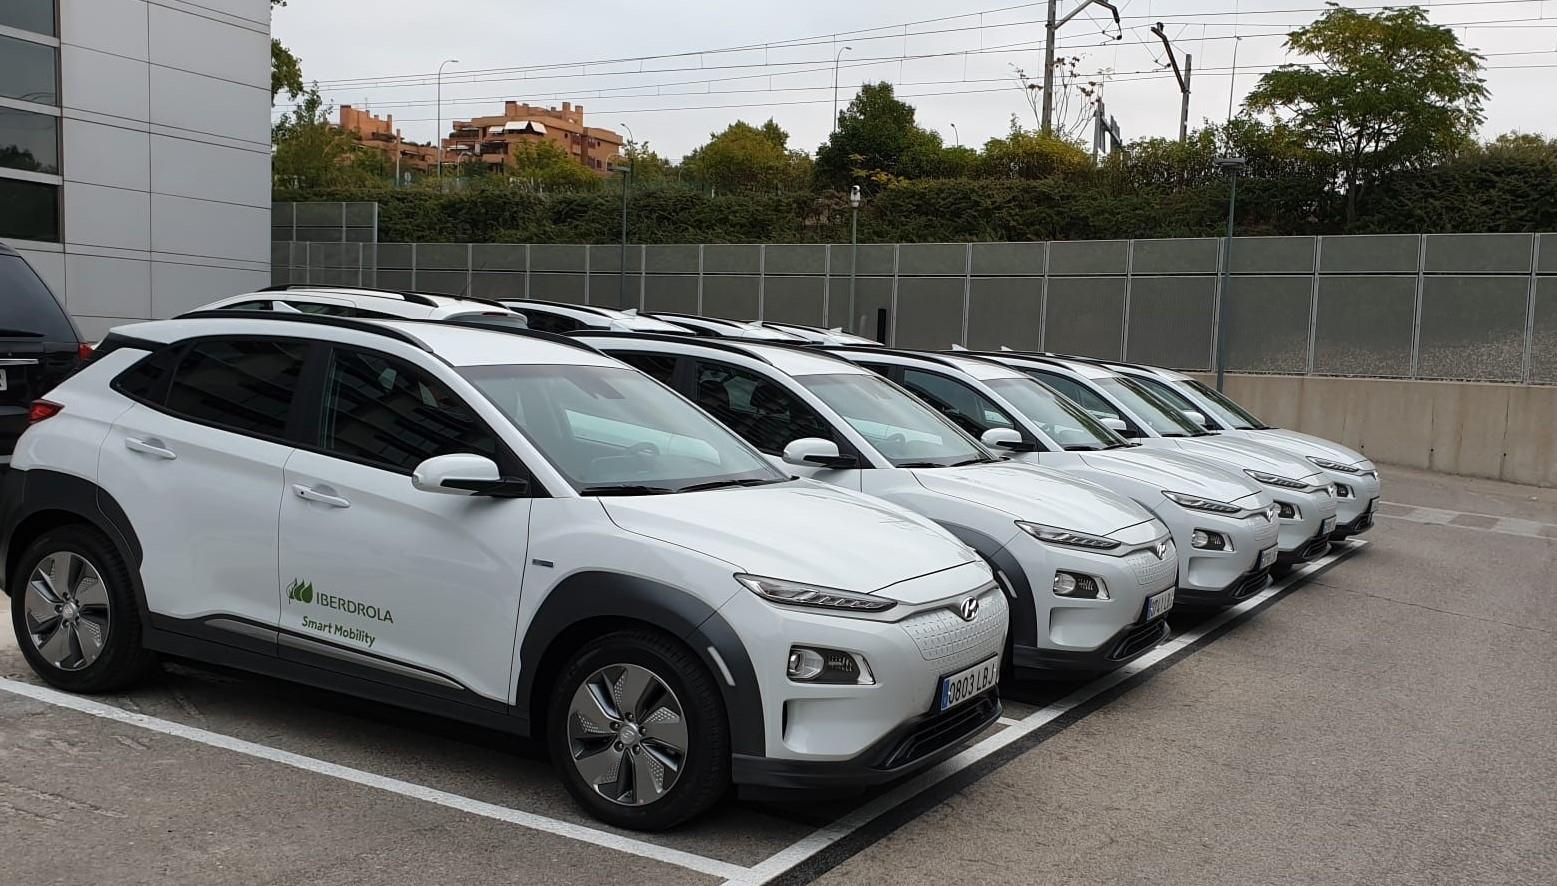 Hyundai entrega 75 Kona eléctrico a Iberdrola